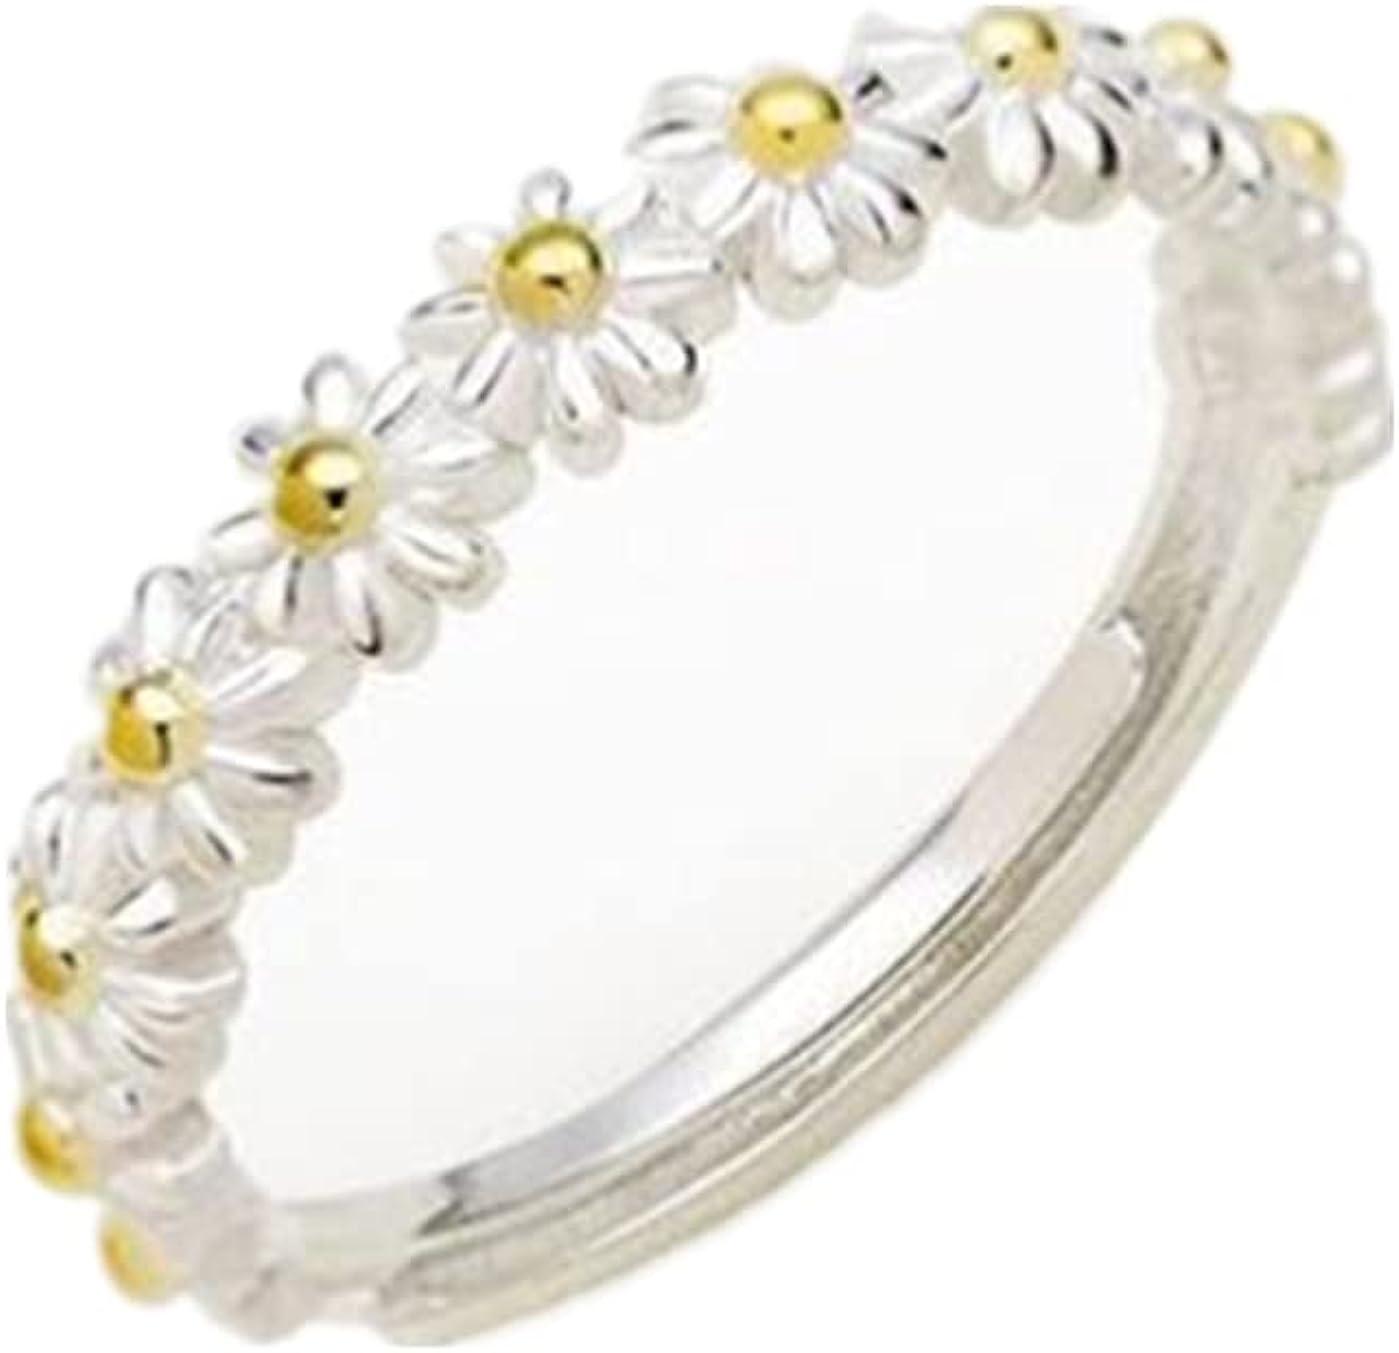 Pingyongchang Small Daisy Flower Ring Fashion Sweet Jewelry for Women Girls